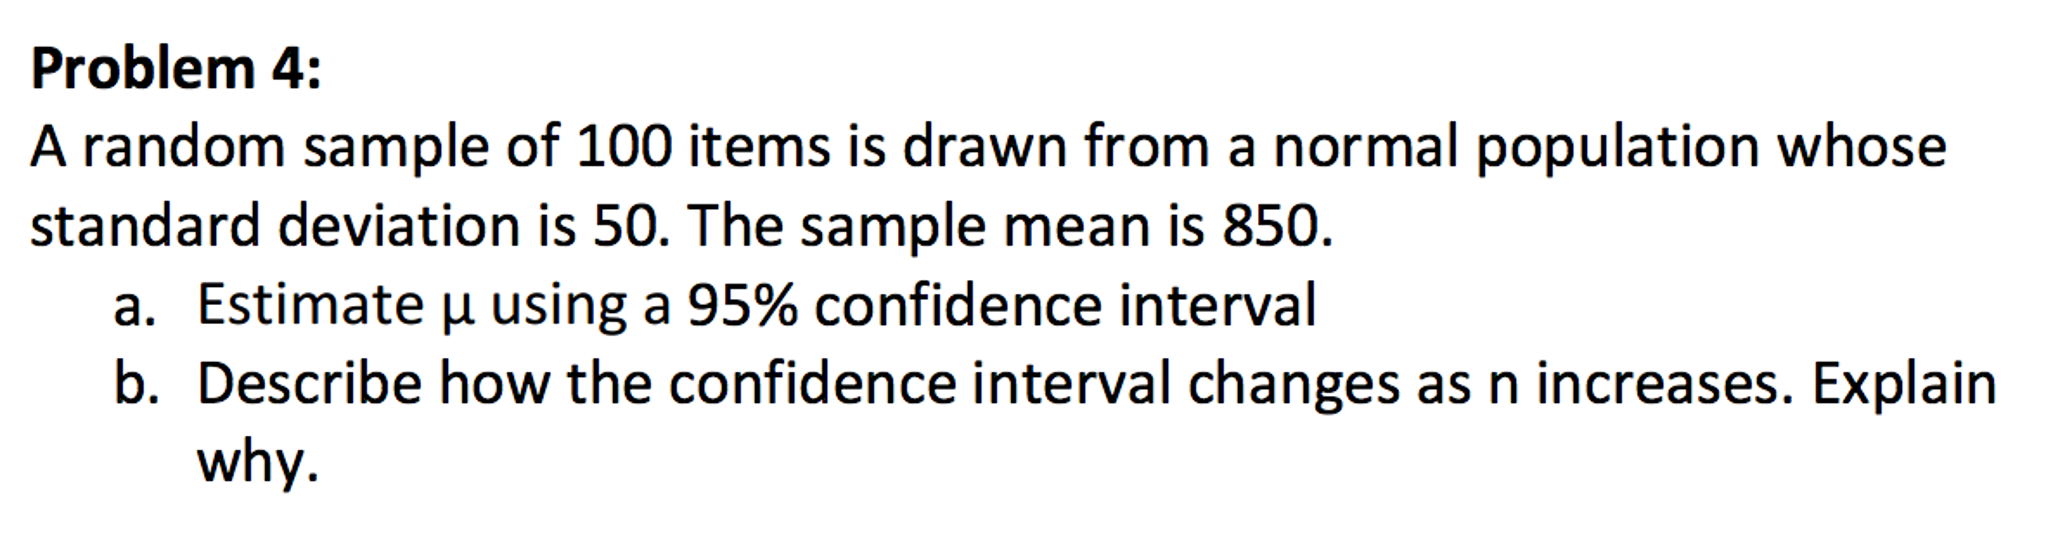 Statistics And Probability Archive   November 20, 2016   Chegg.com